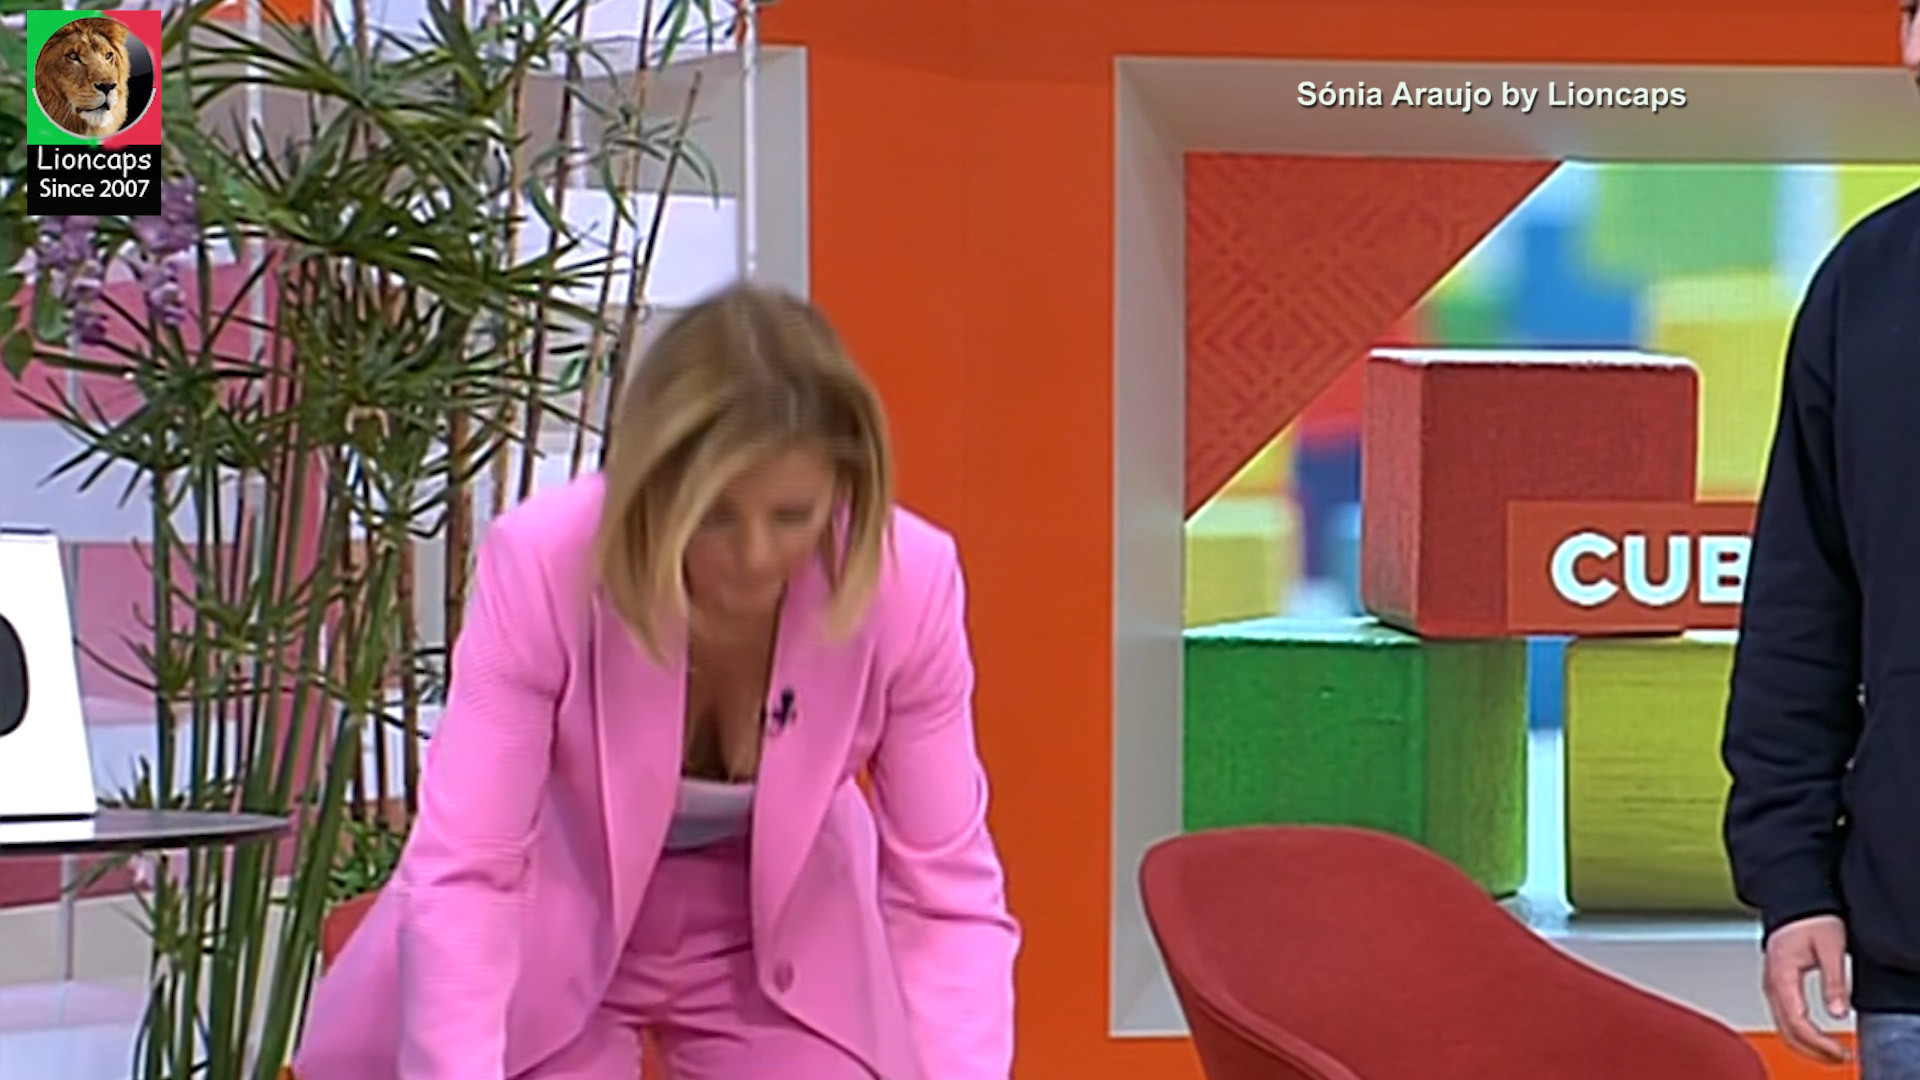 sonia_araujo_praca_lioncaps_11_04_2021 (14).jpg